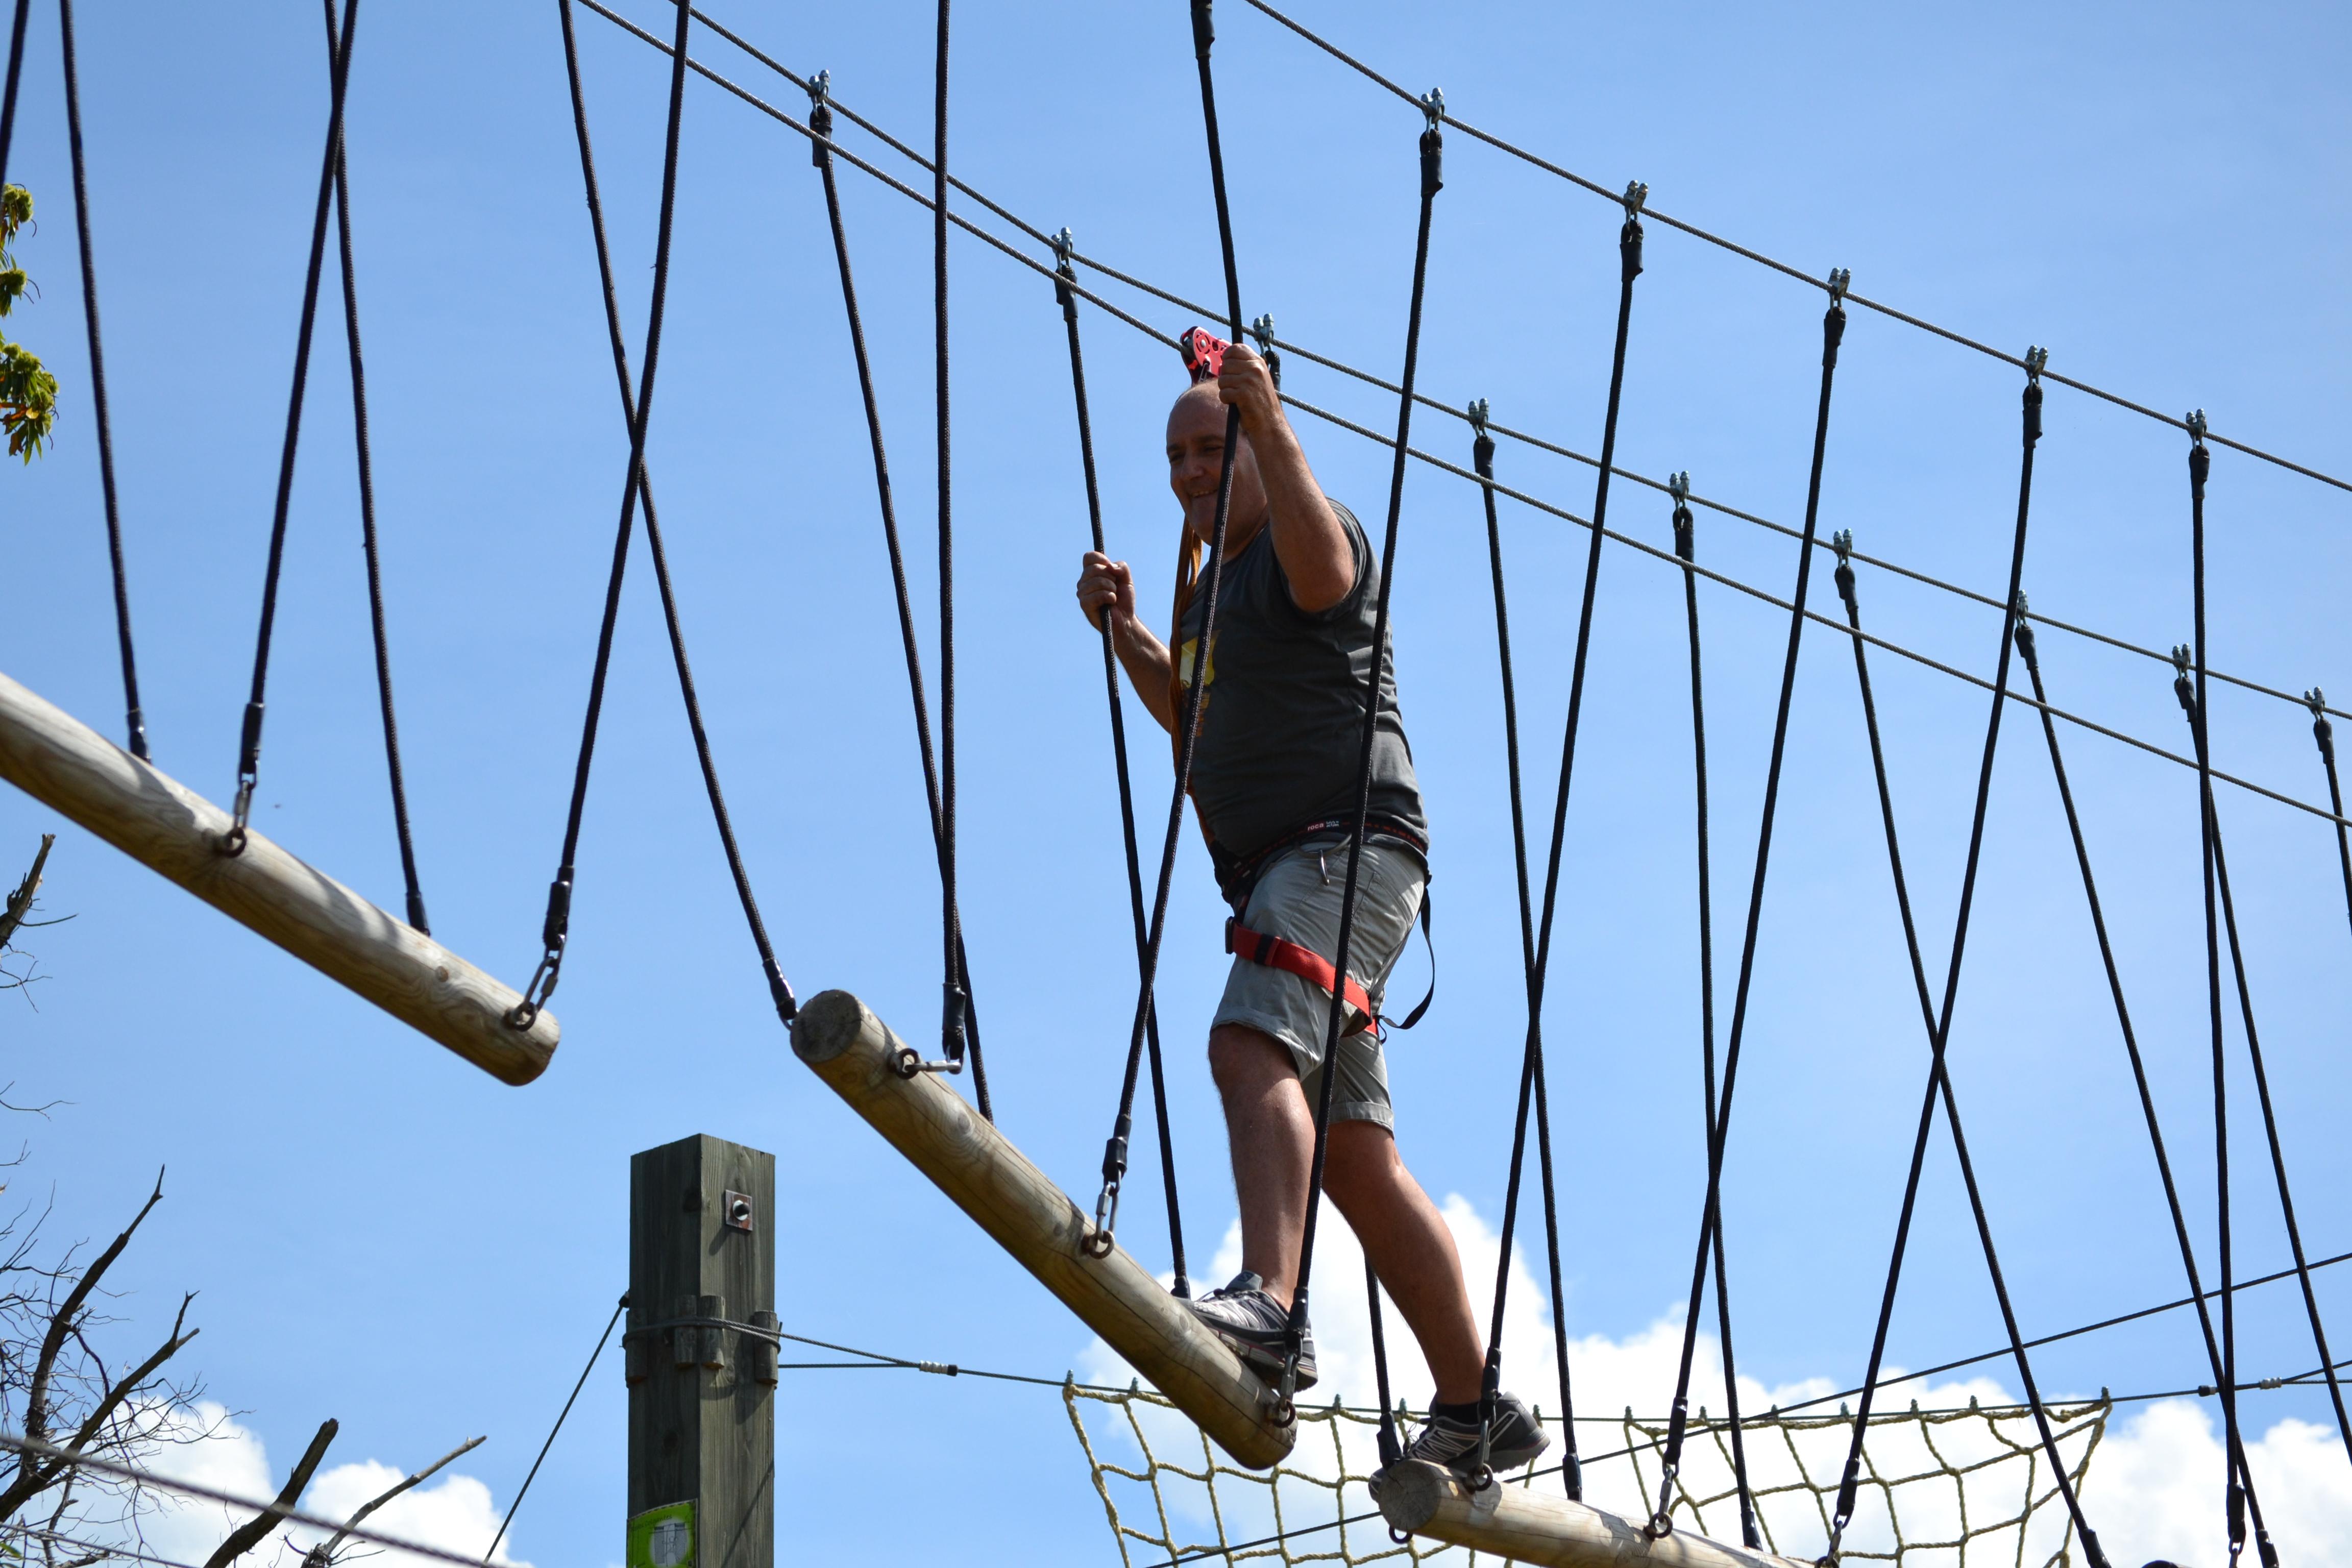 juegos_altura_tirolinas_12_Cantabria_Parque_multiaventura_ocio_juegos_cabuerniaventura